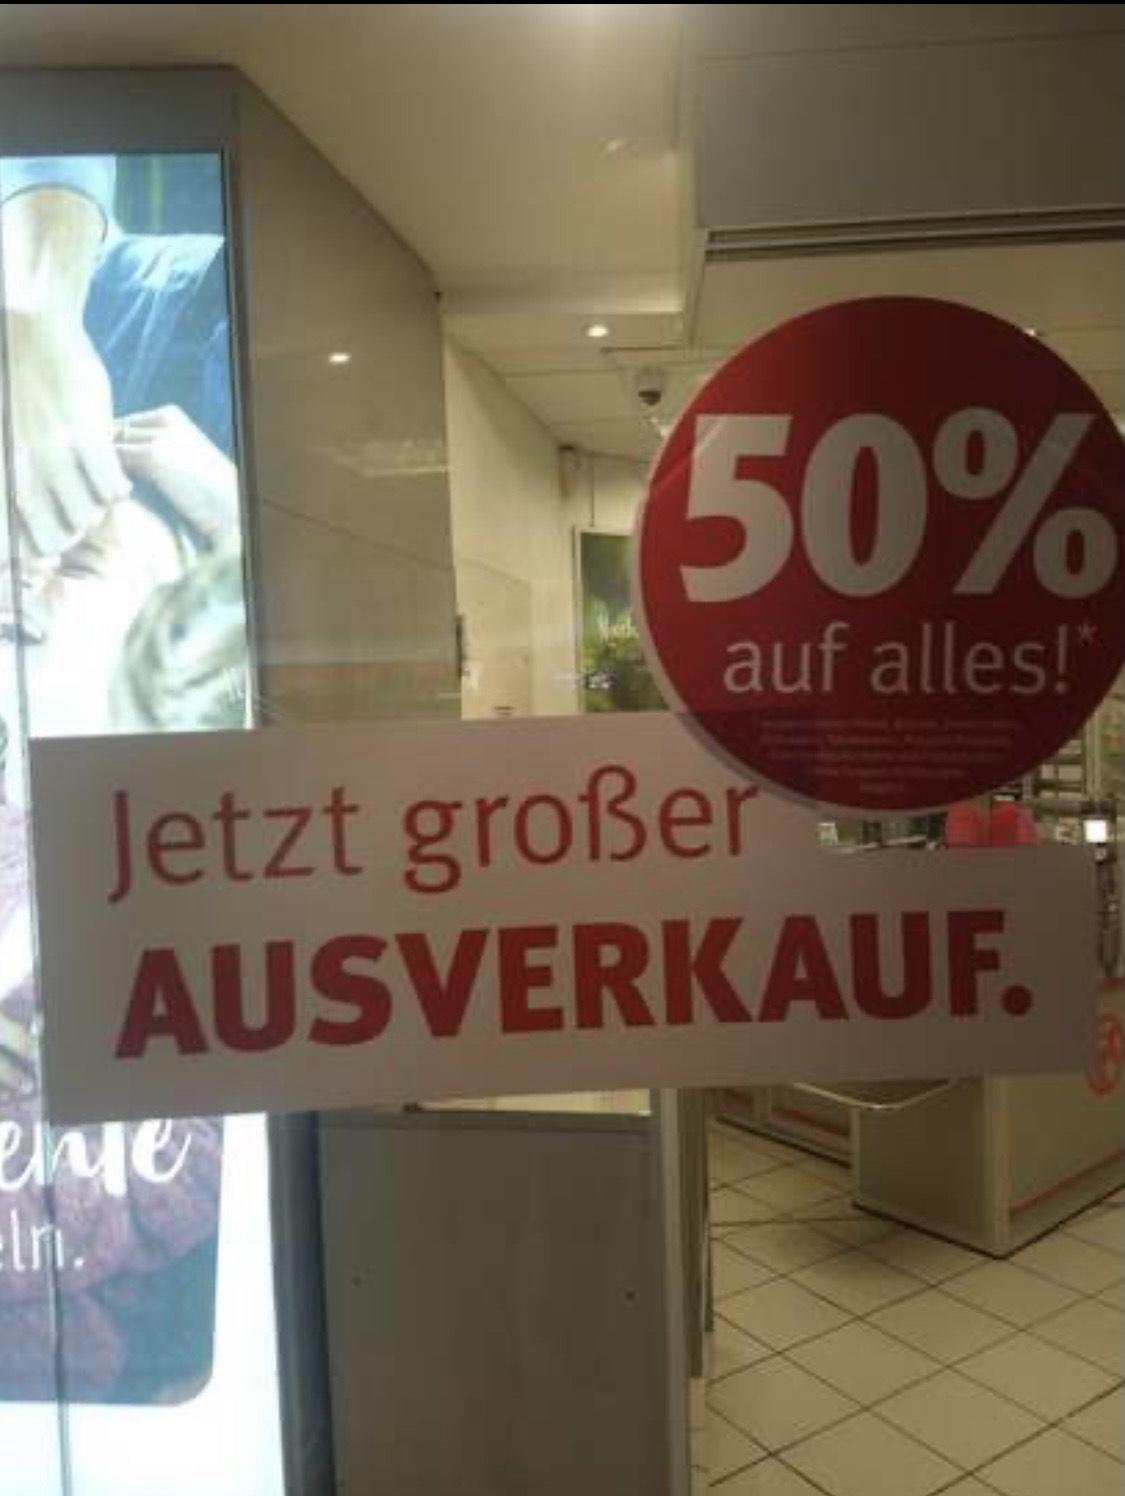 [Lokal Rossmann Hannover Hbf] 50% auf alles